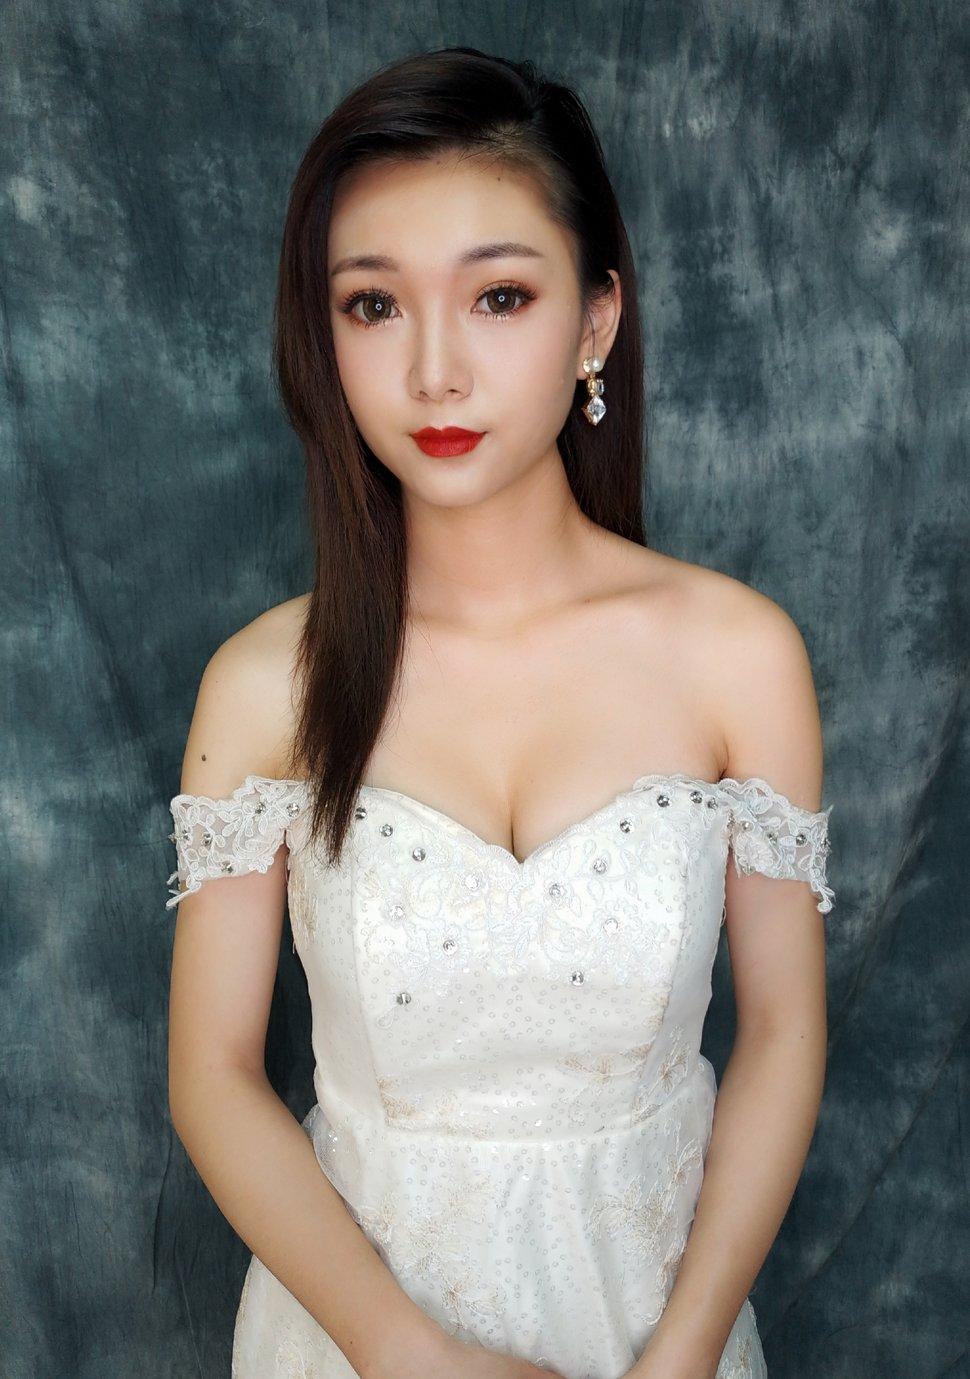 D7294C1F-5F48-4DC1-A633-203F292D73A8 - Nanami 張慈慈《結婚吧》